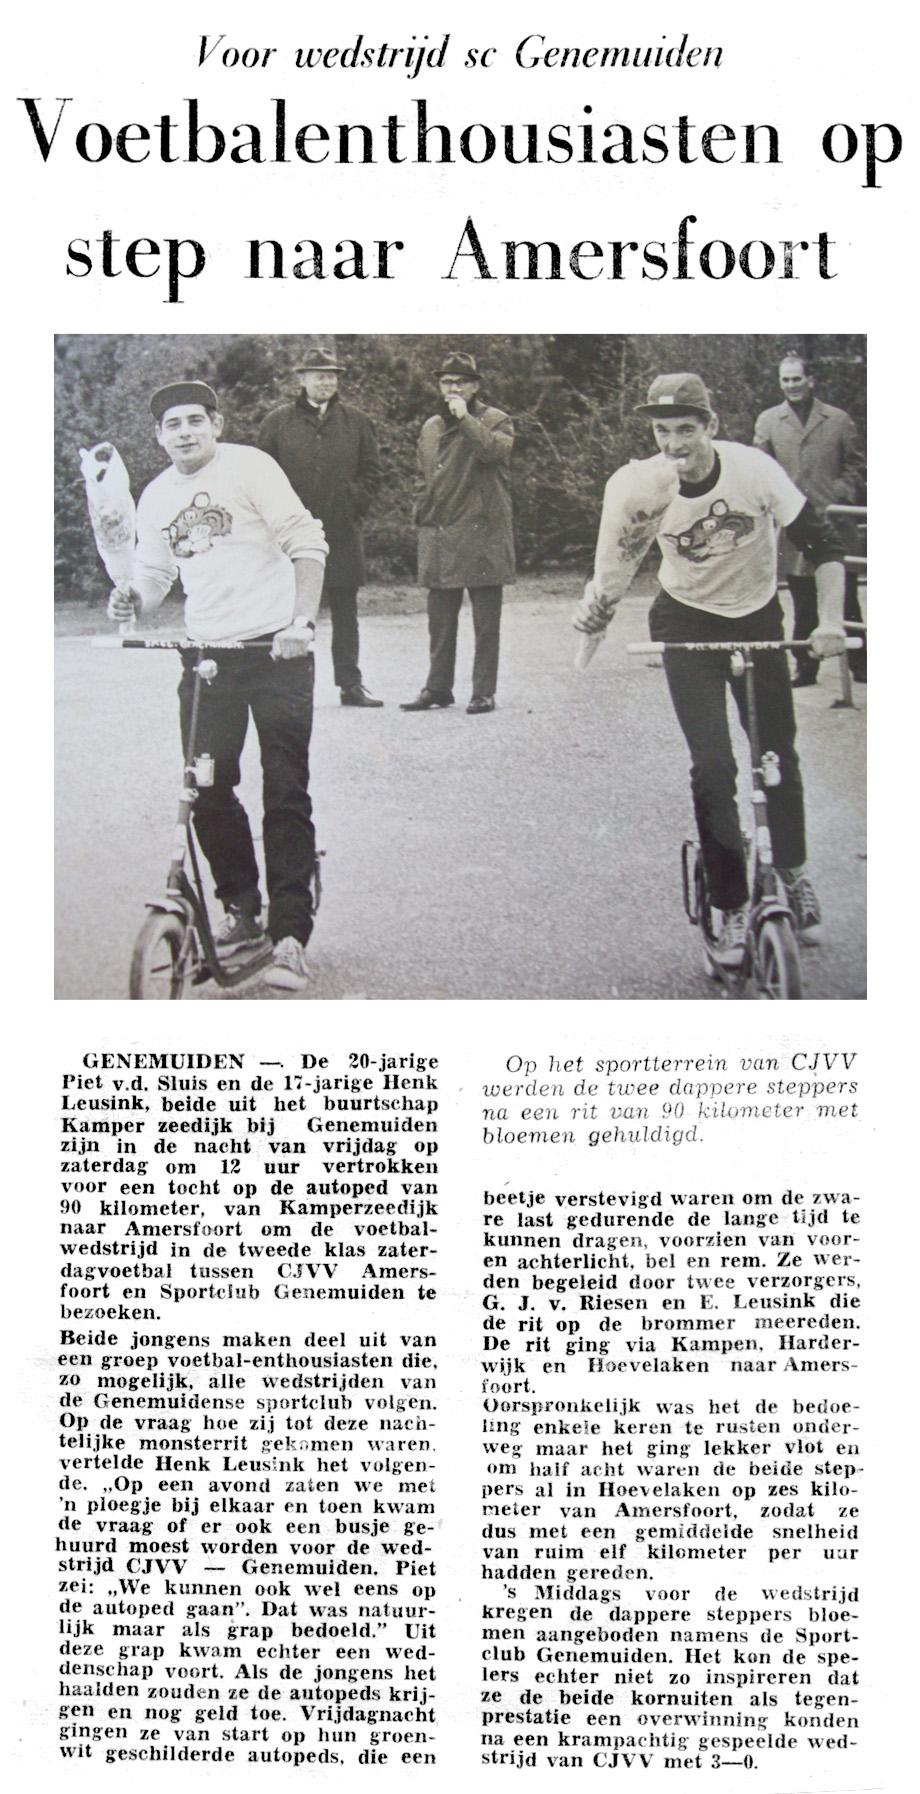 1967-steppen